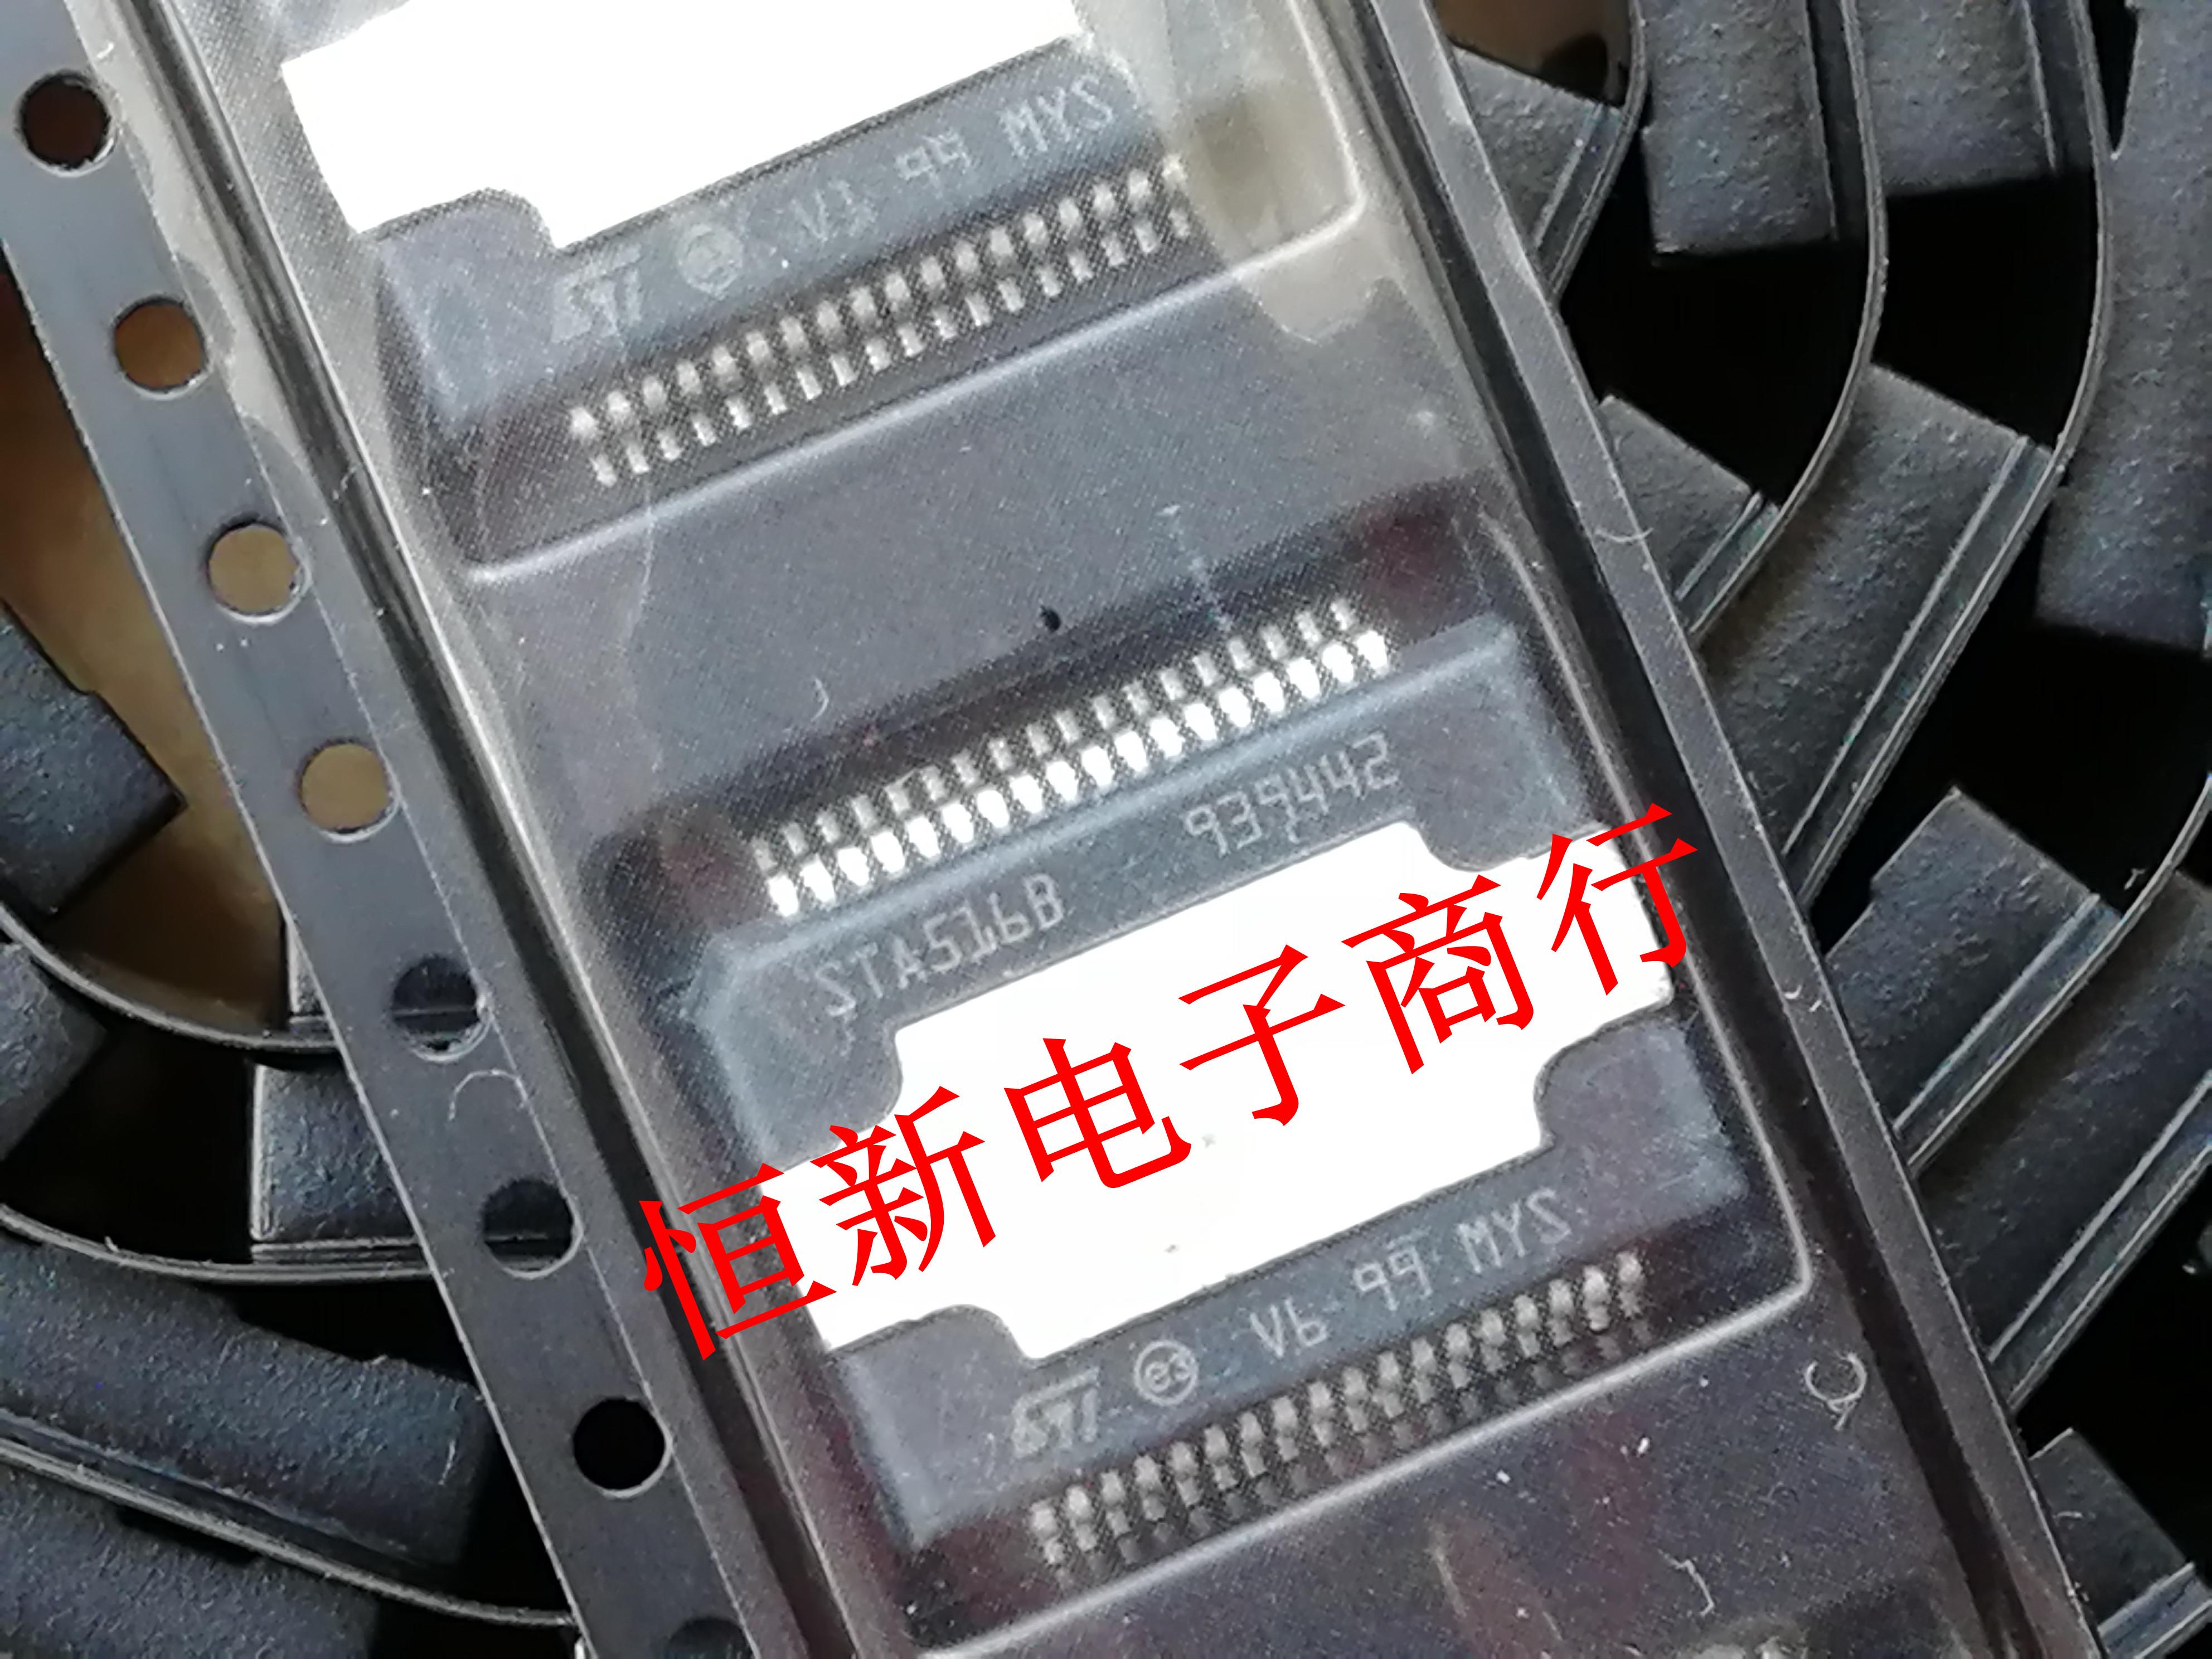 STA516B STA5168  专营全系列音频功放放大器 全新正品可直拍